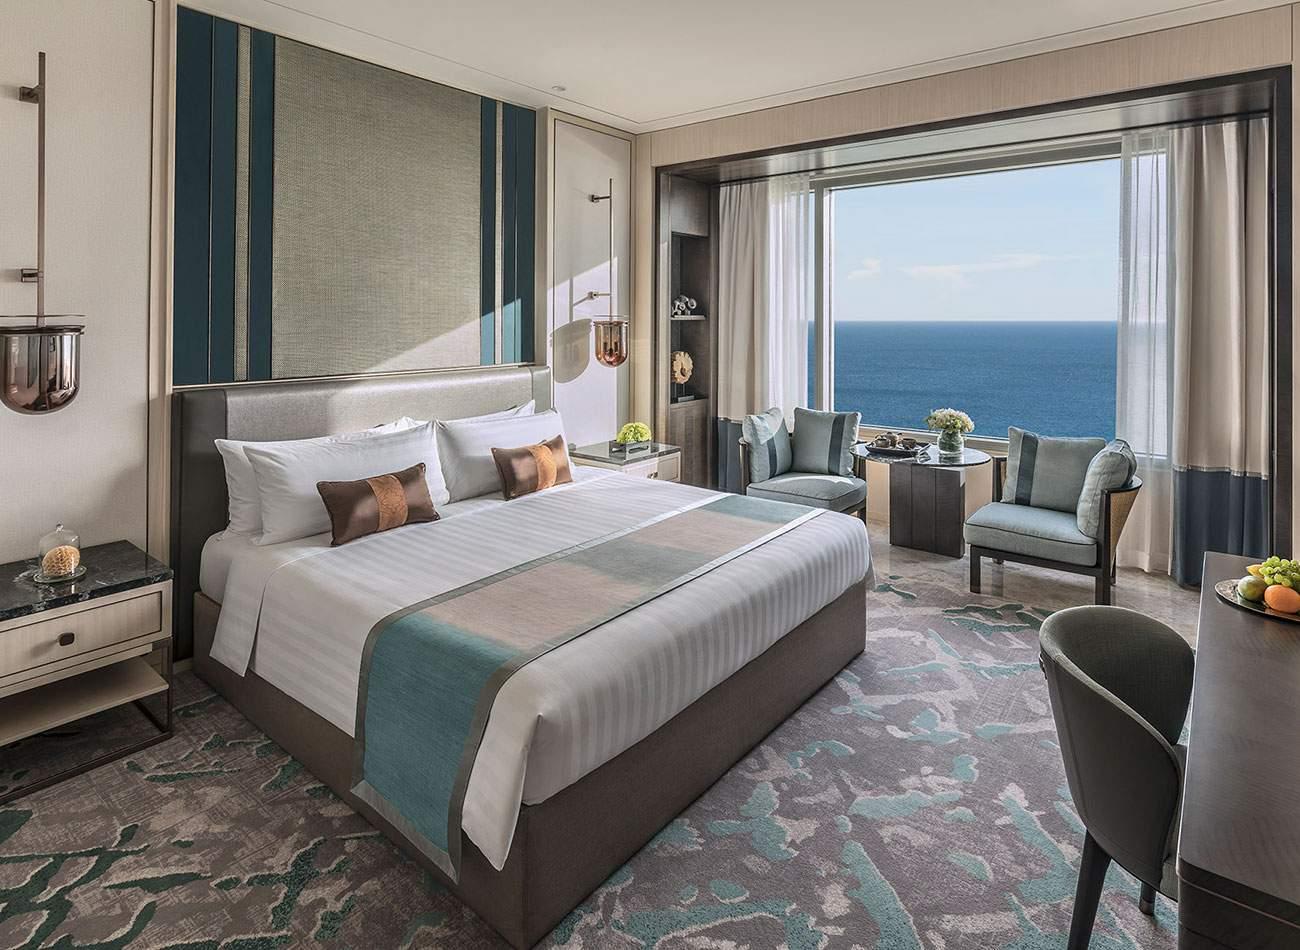 Shangri%20La%20Hotel%20Colombo%20deluxe-ocean-view-room_king.jpg